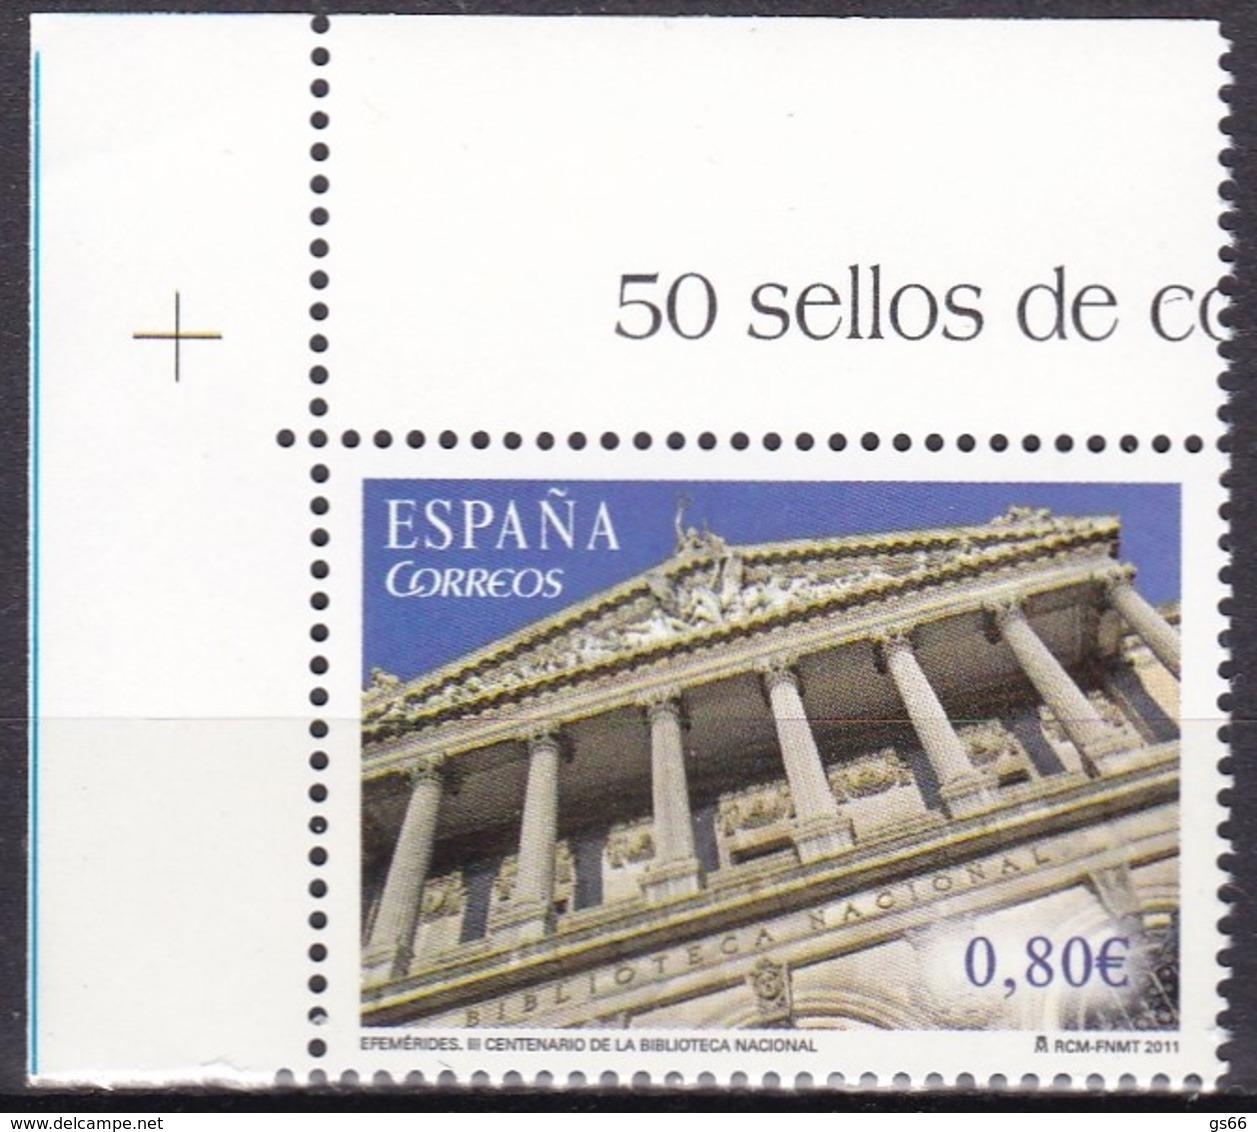 2011,  Spanien, 4650, Nationalbibliothek, Biblioteca Nacional, MNH ** - 1931-Hoy: 2ª República - ... Juan Carlos I